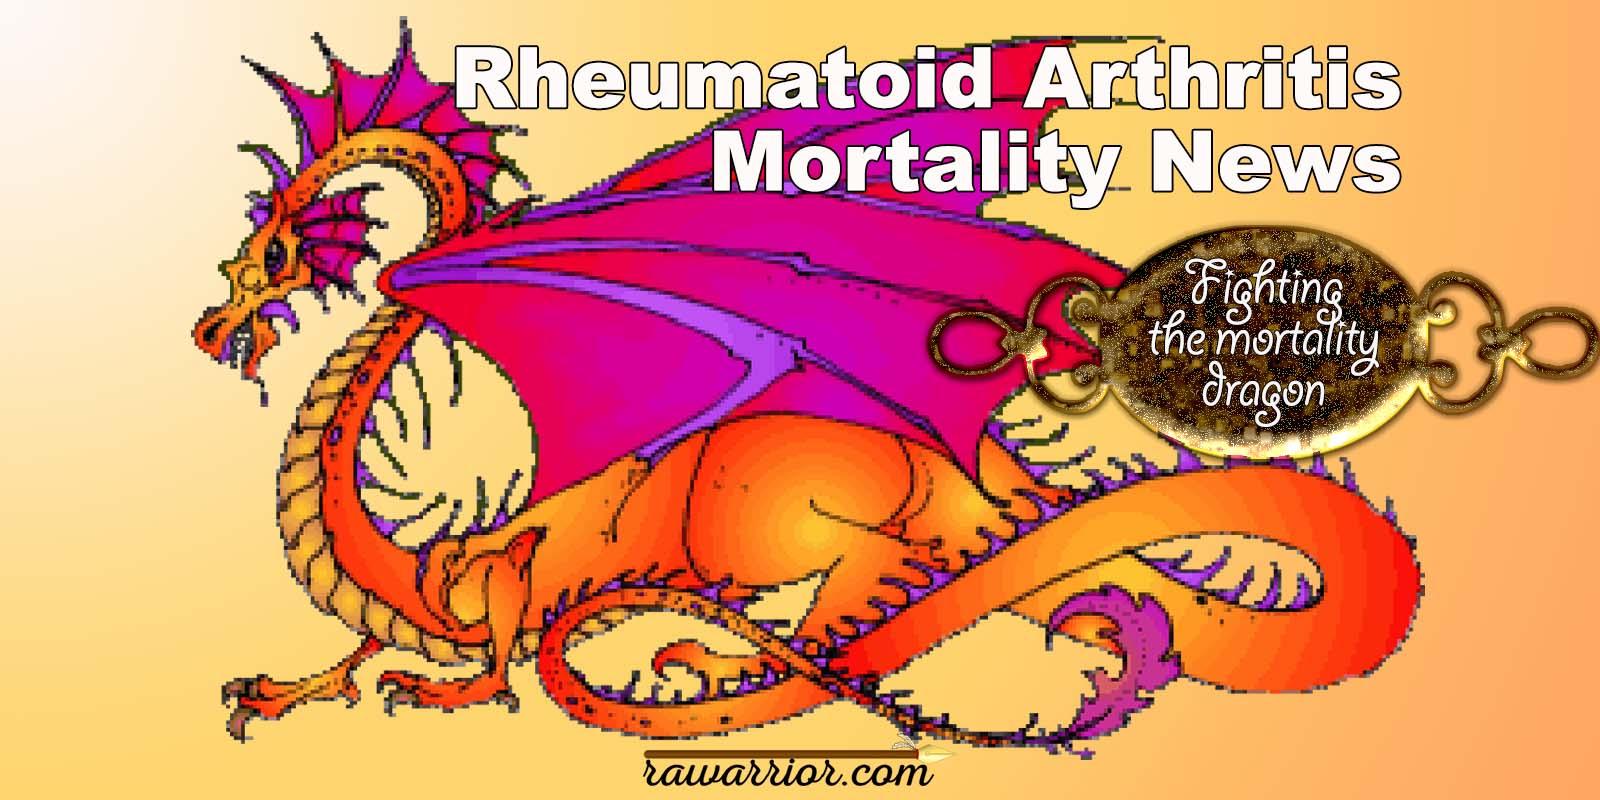 rheumatoid arthritis mortality news